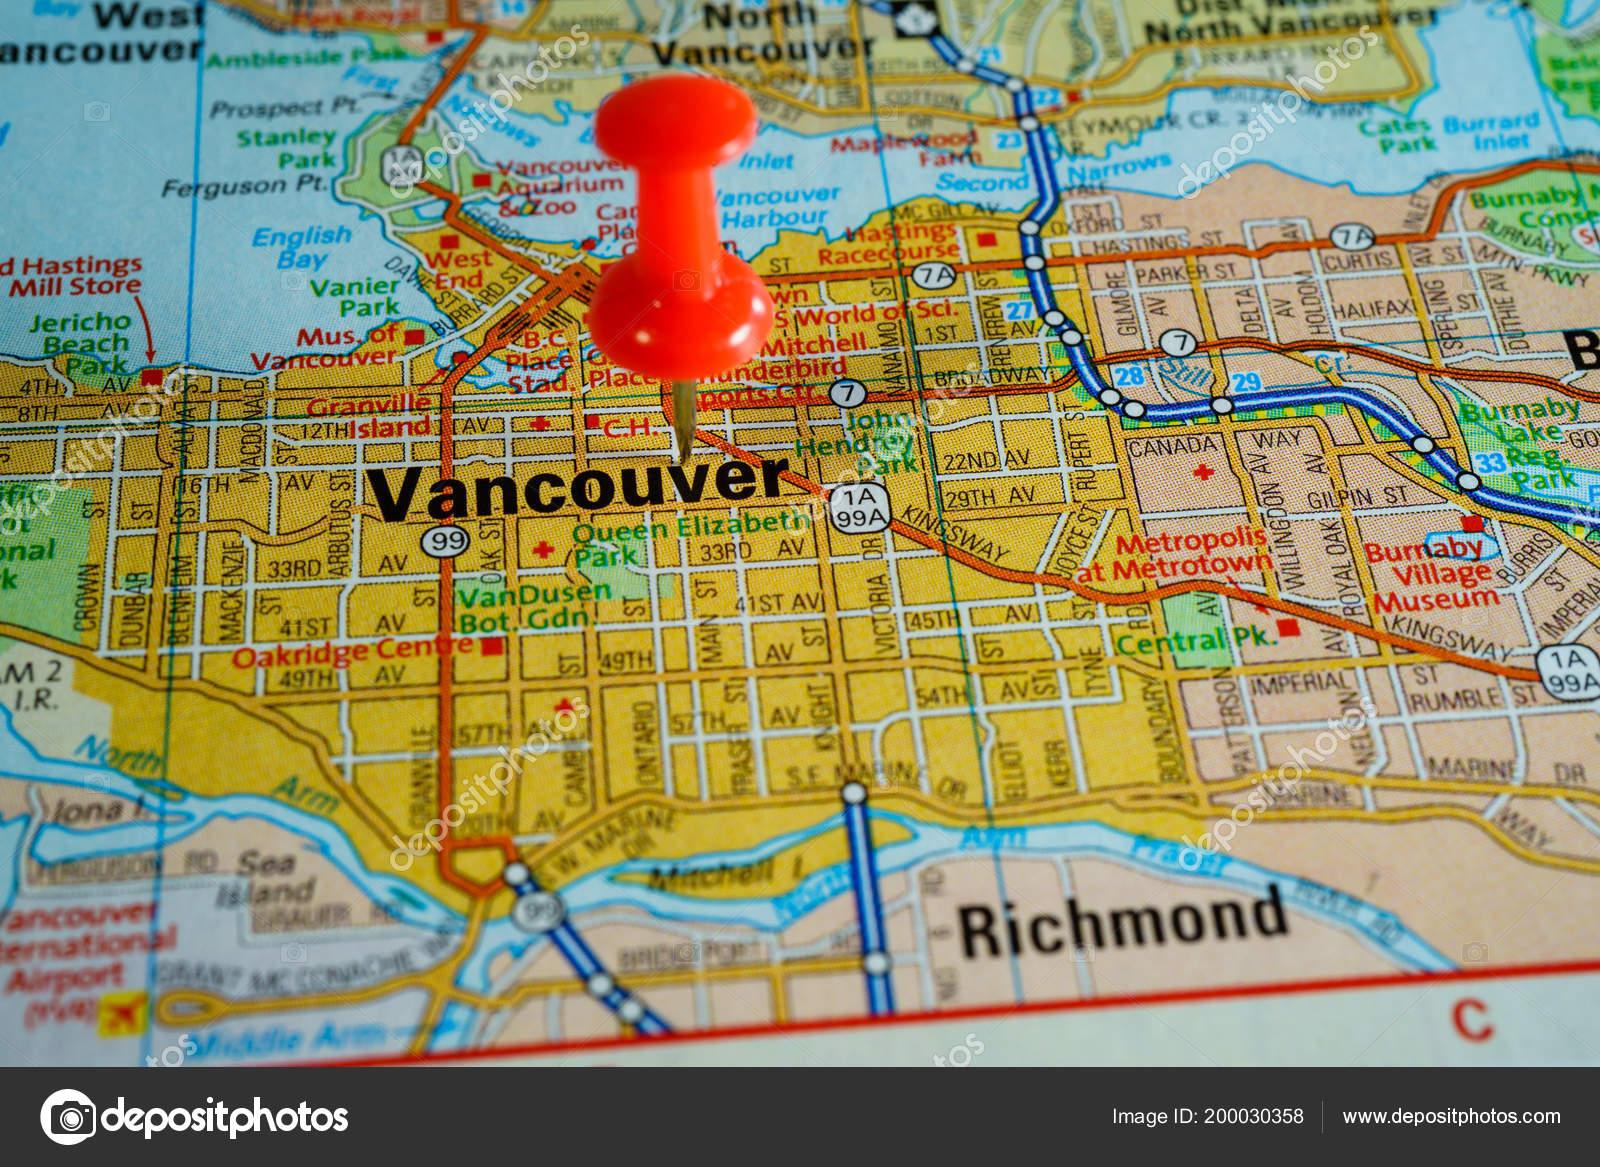 Vancouver Canada Map Stock Photo C Aallm 200030358